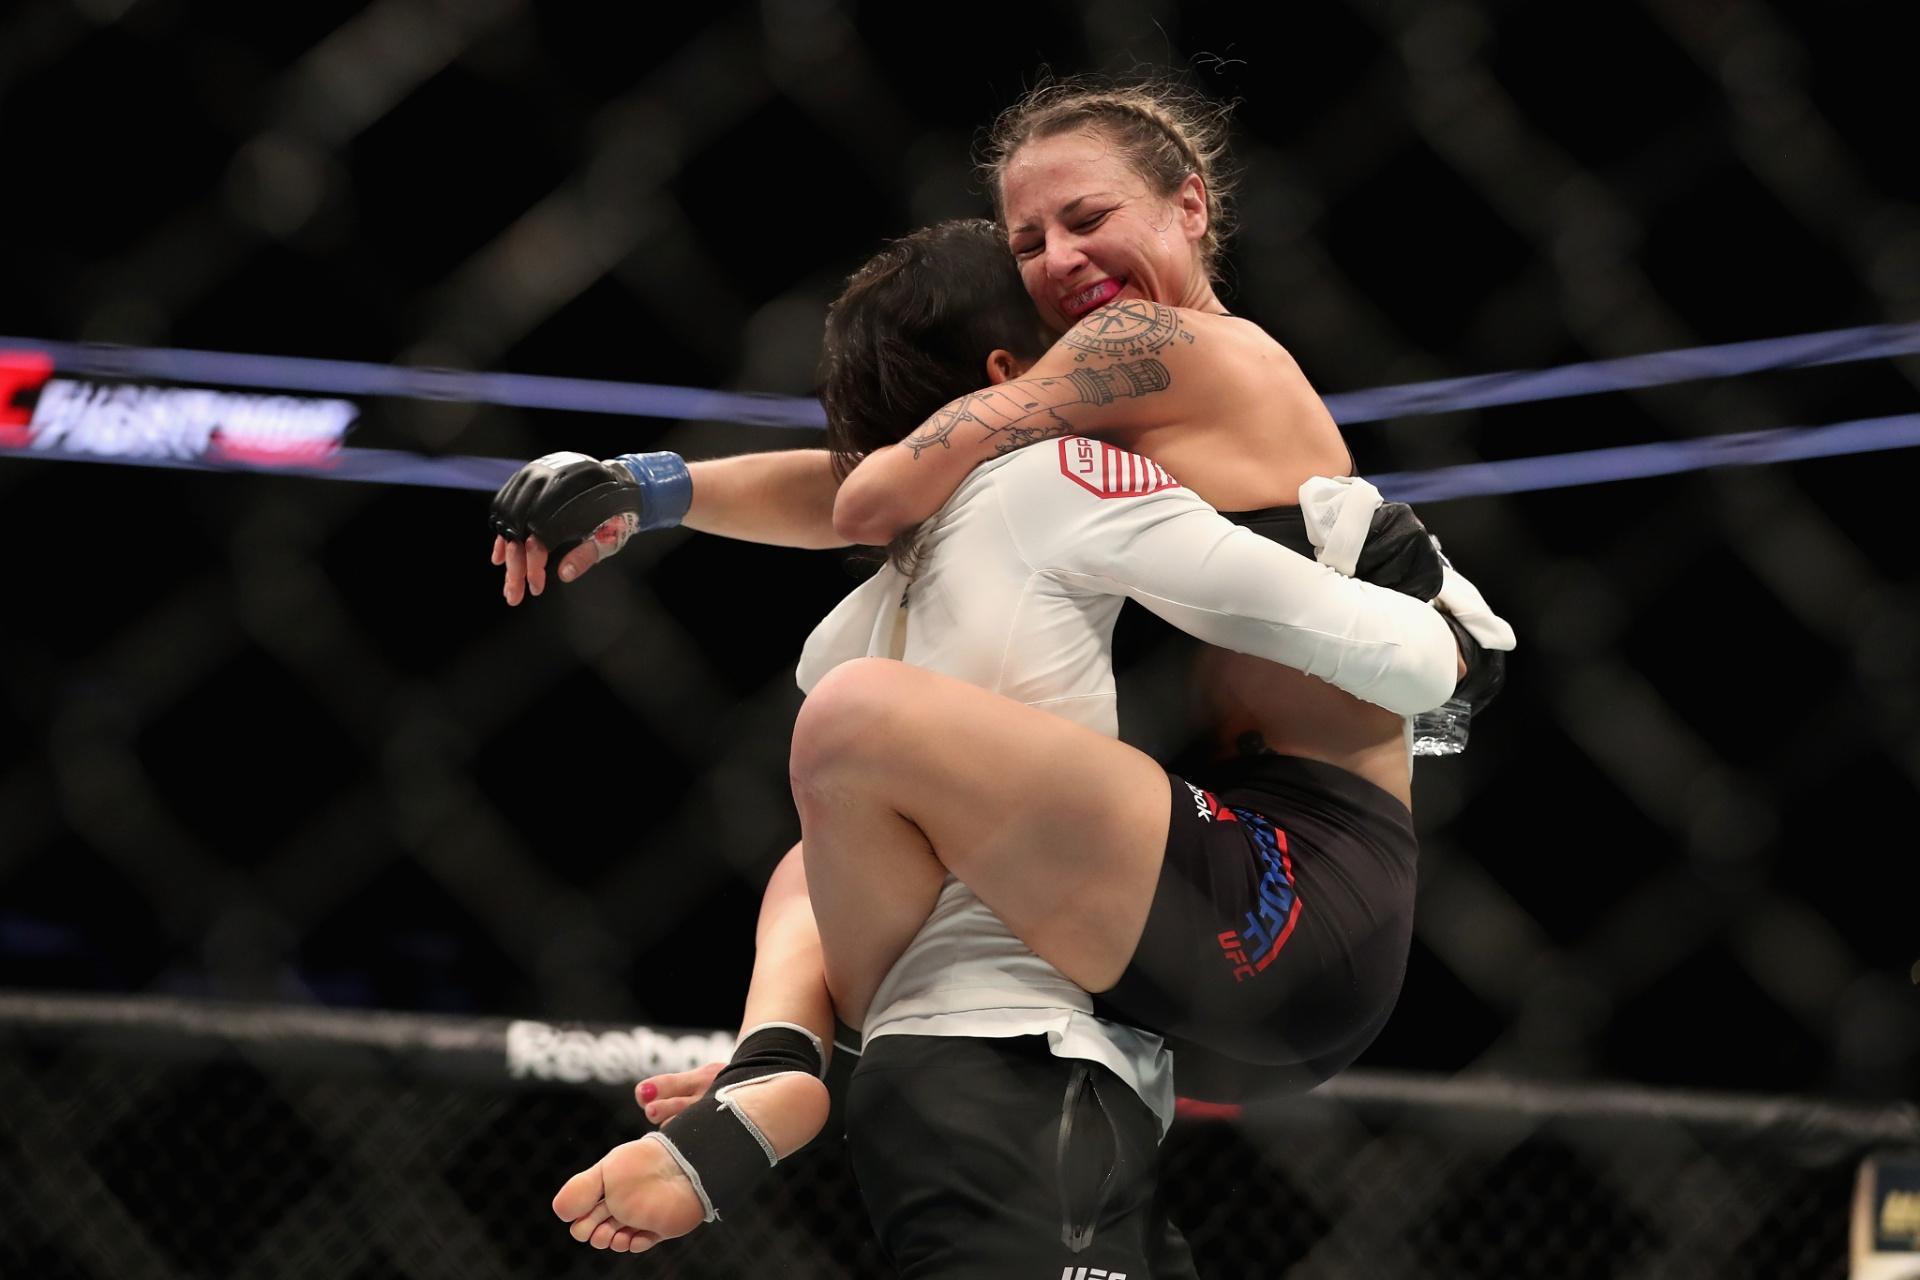 Especial - Amanda Nunes comemora vitória da namorada Nina Ansaroff sobre Jocelyn Jones-Lybarger